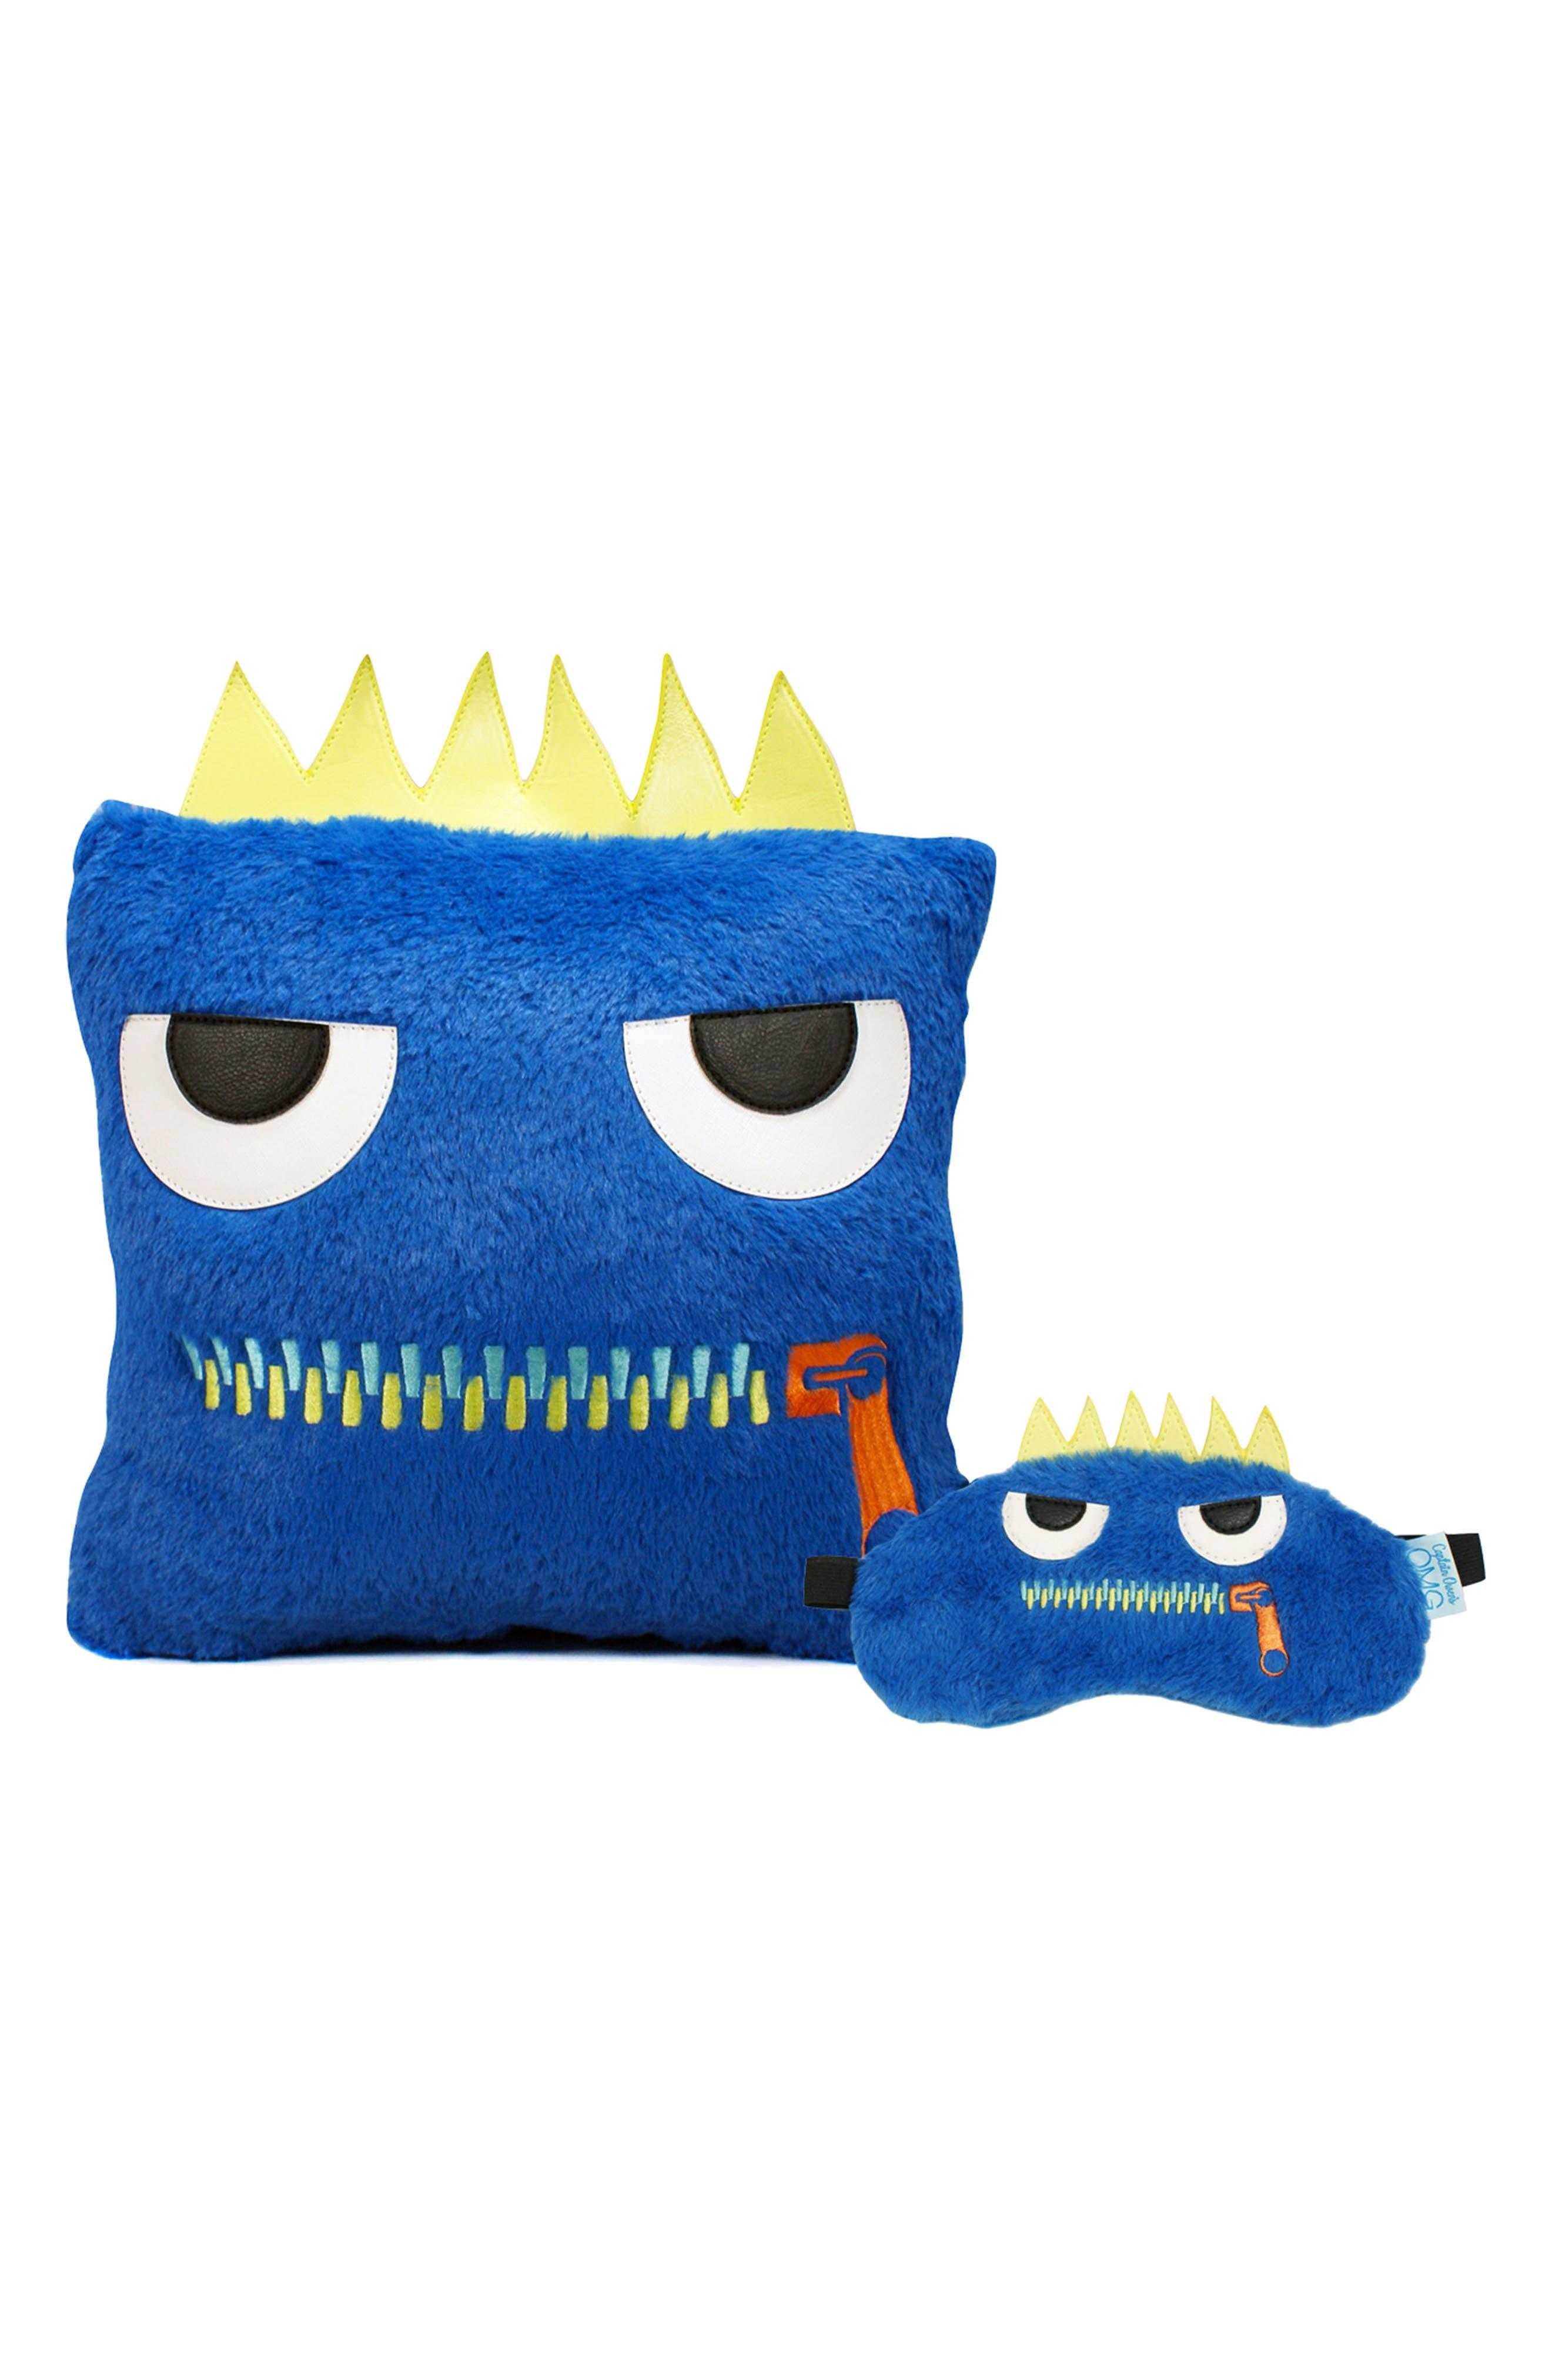 OMG Accessories Omg Zippy Pillow & Sleep Mask Set, Size One Size - Blue